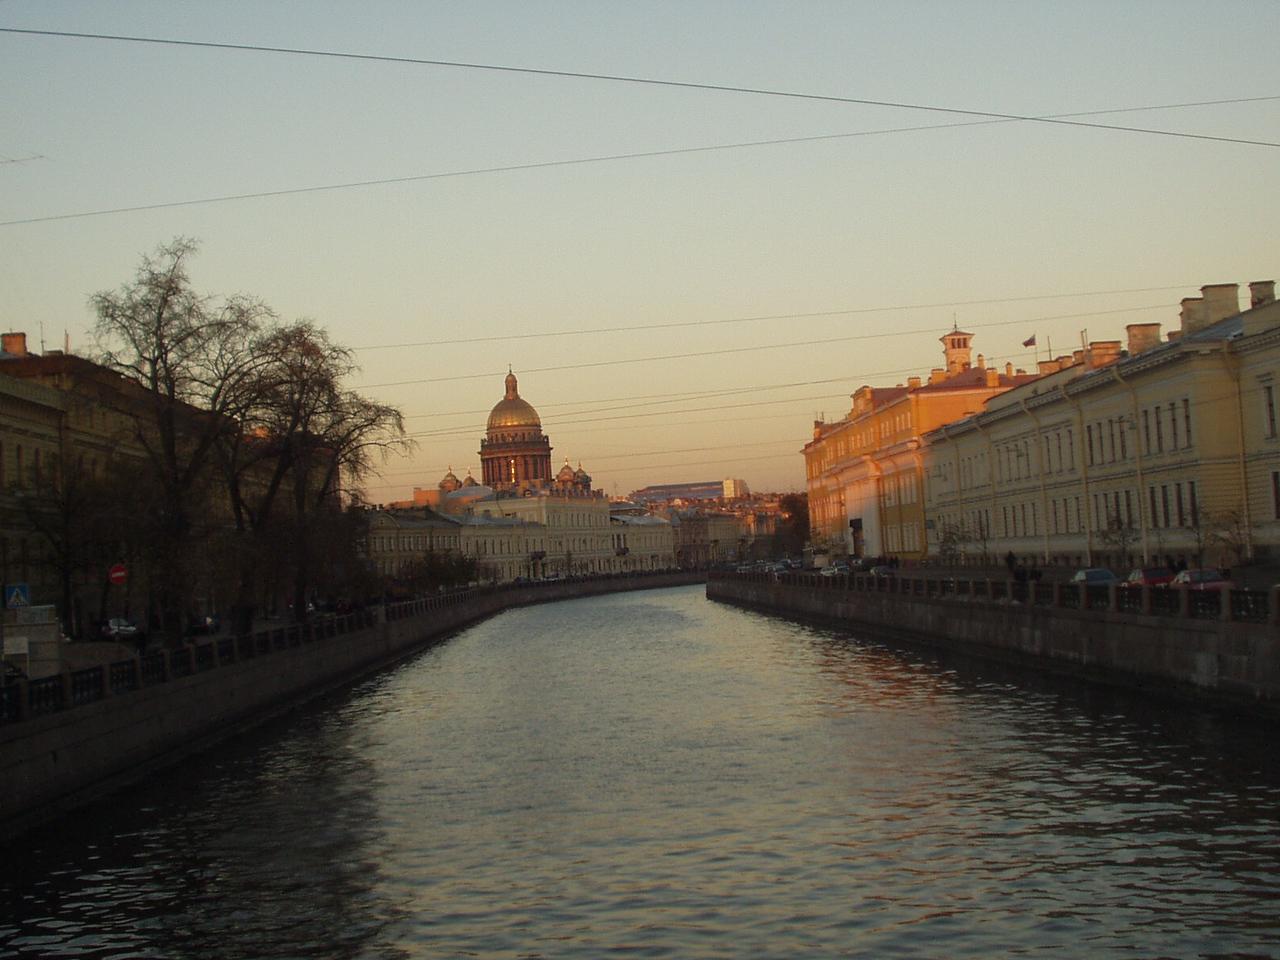 canals01.jpg